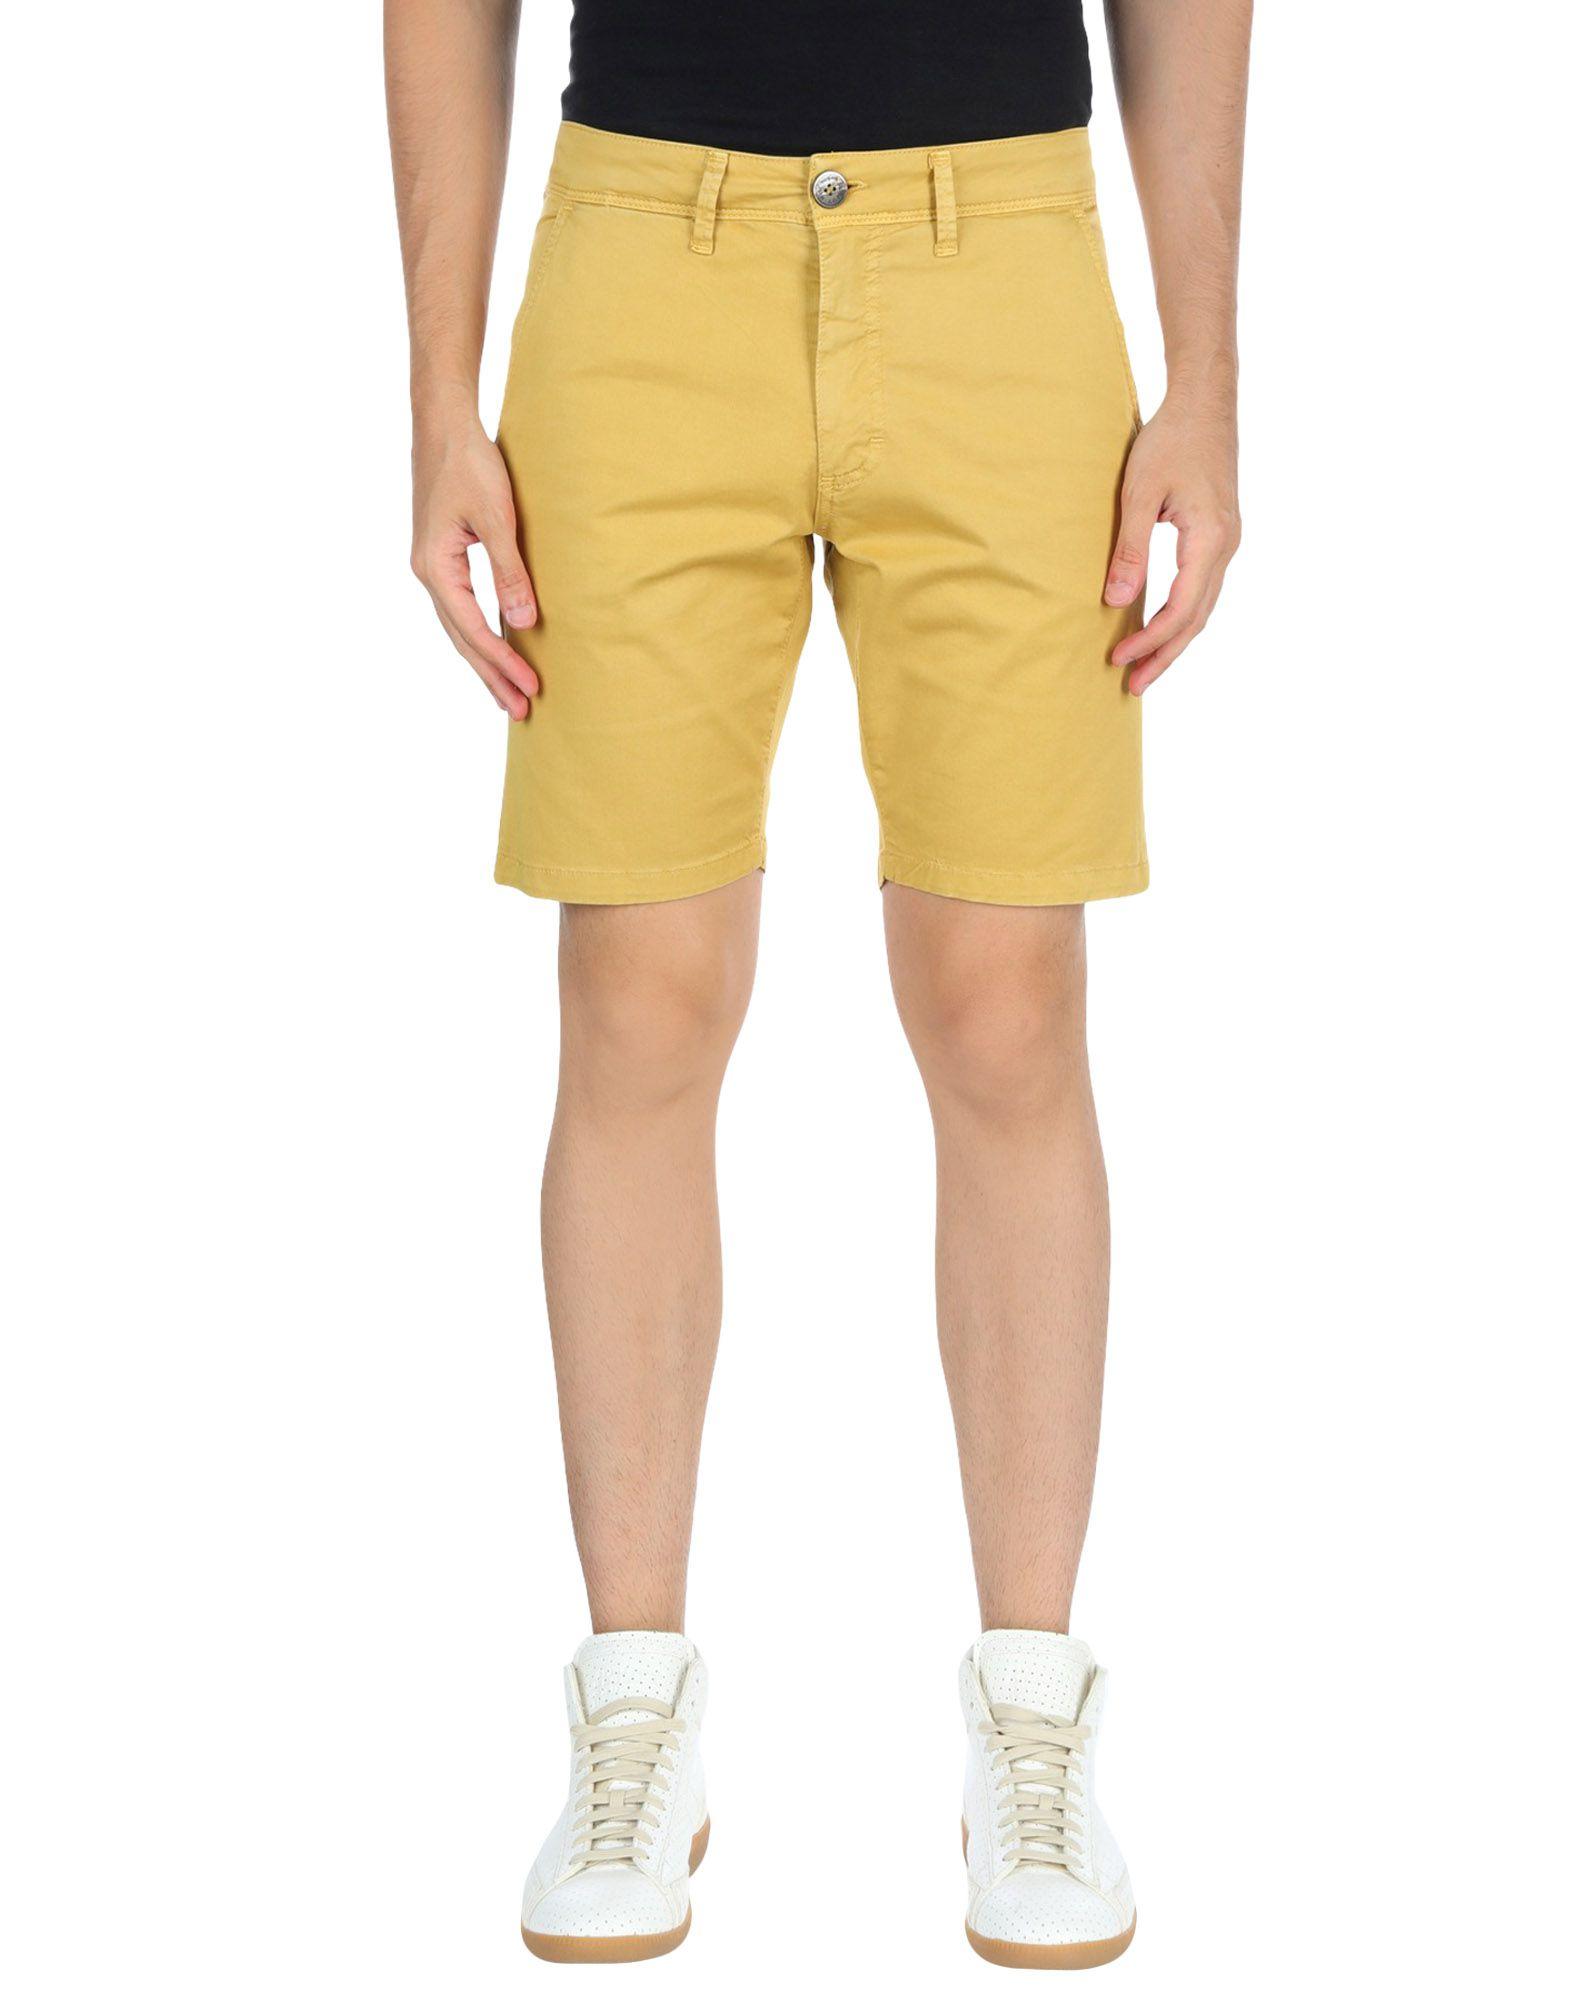 ENJOY BRAND+JEANS Бермуды 2017 men jeans summer new fashion brand casual black cotton denim jeans justin biber ripped skinny trousers size 27 36 t047